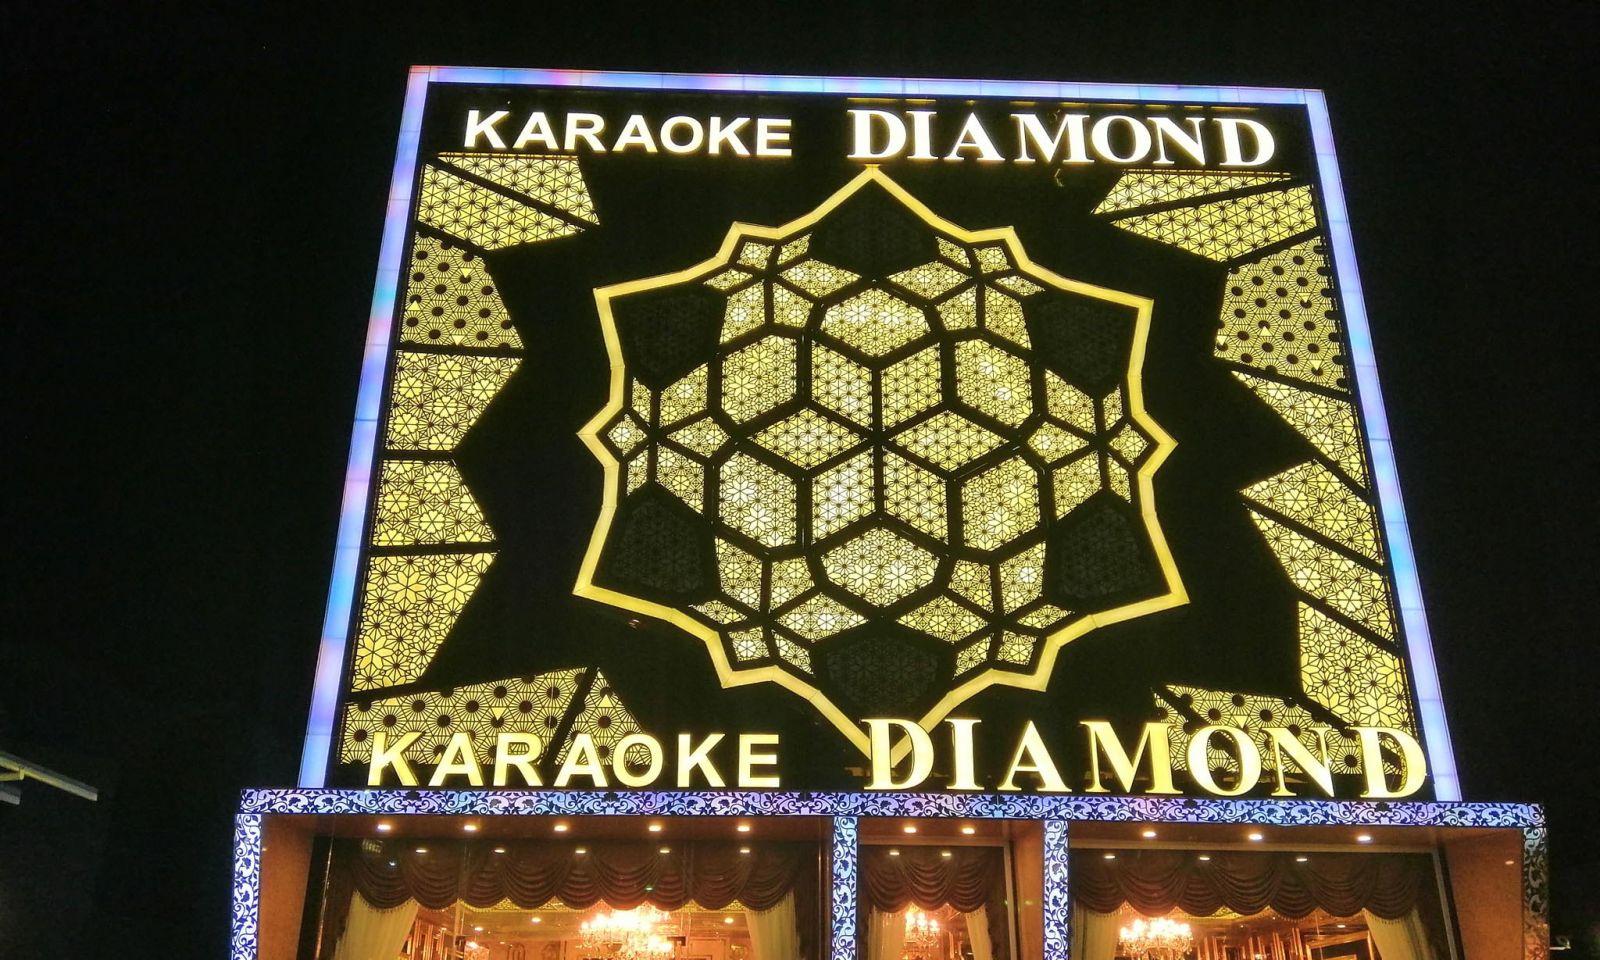 KARAOKE DIAMOND